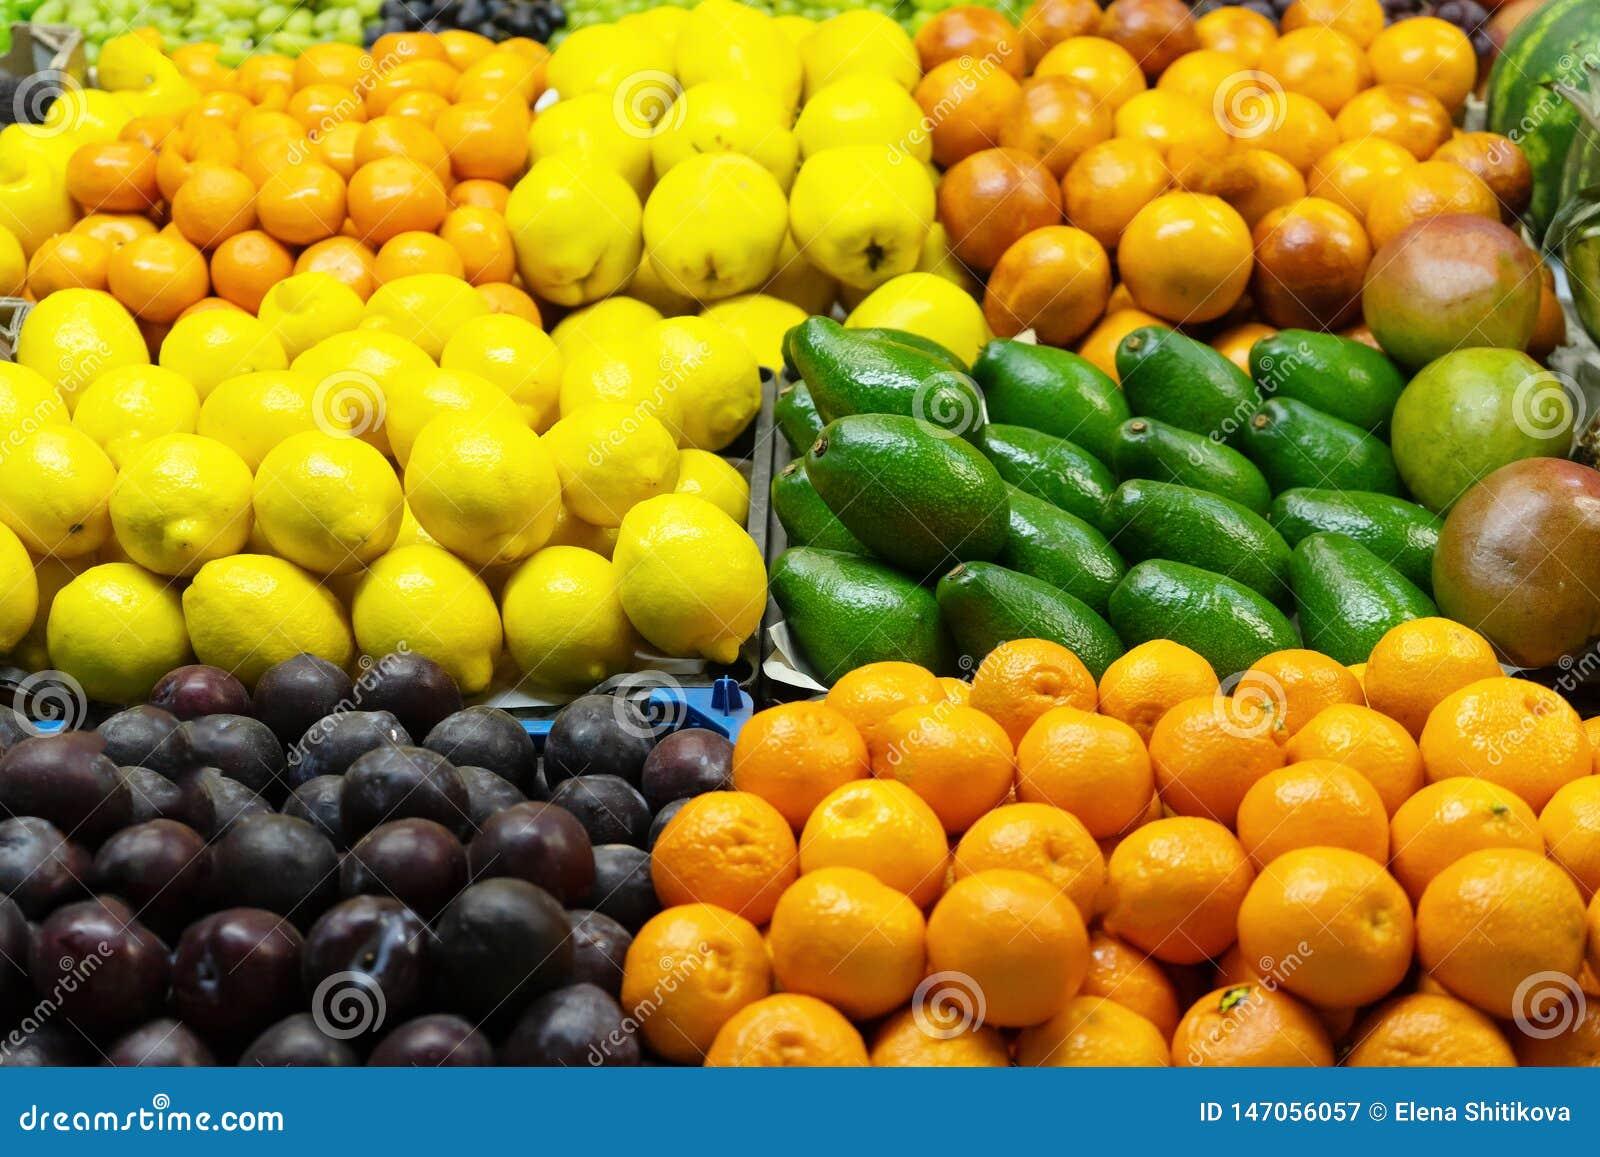 Fruits frais march? Plan rapproch?